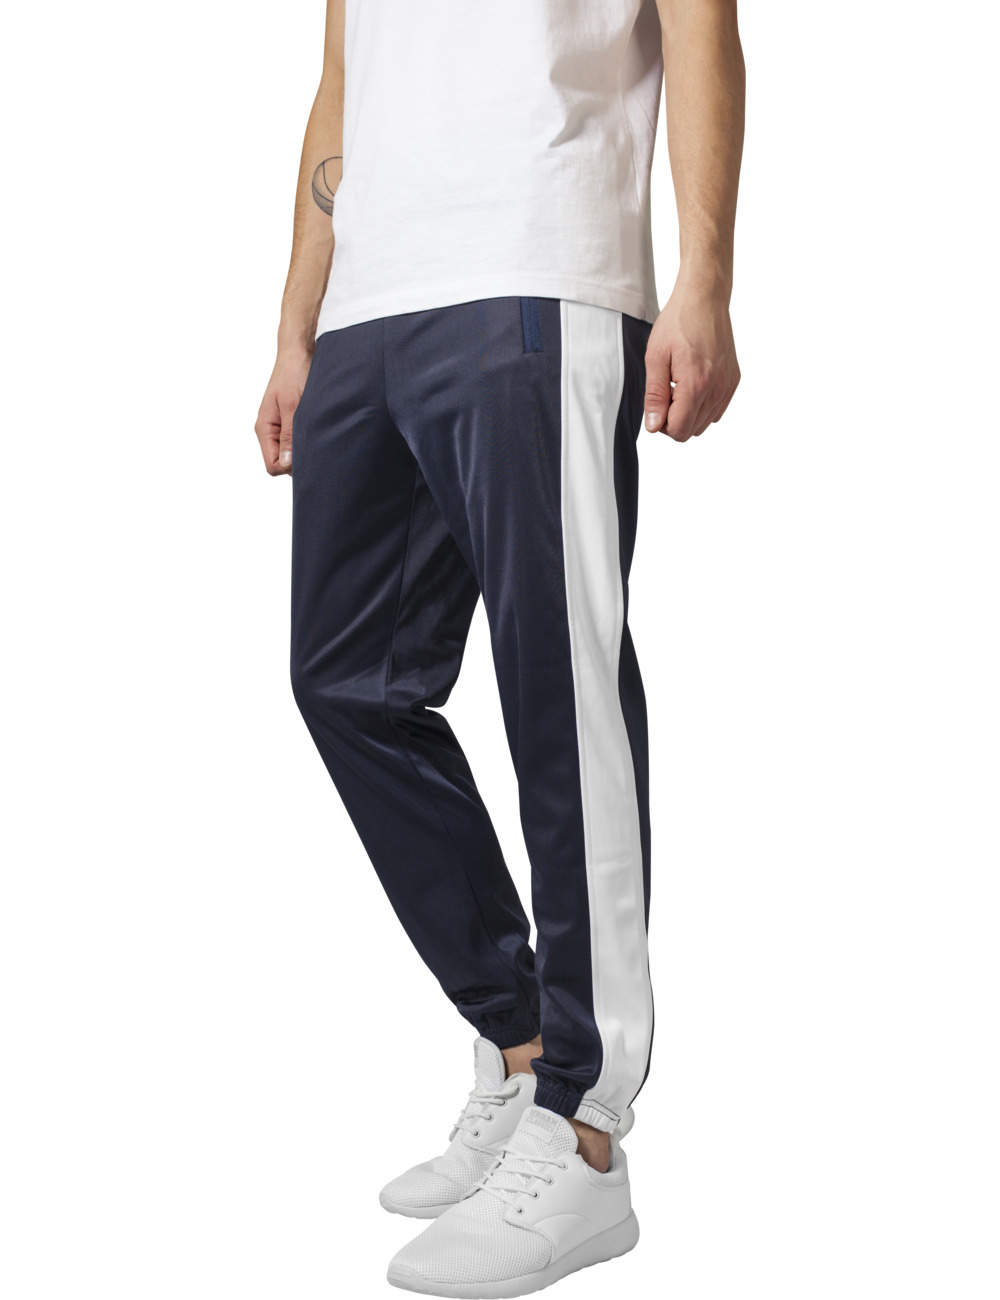 Urban Classics Herren Sweatpants Track M, navy/wht (159)